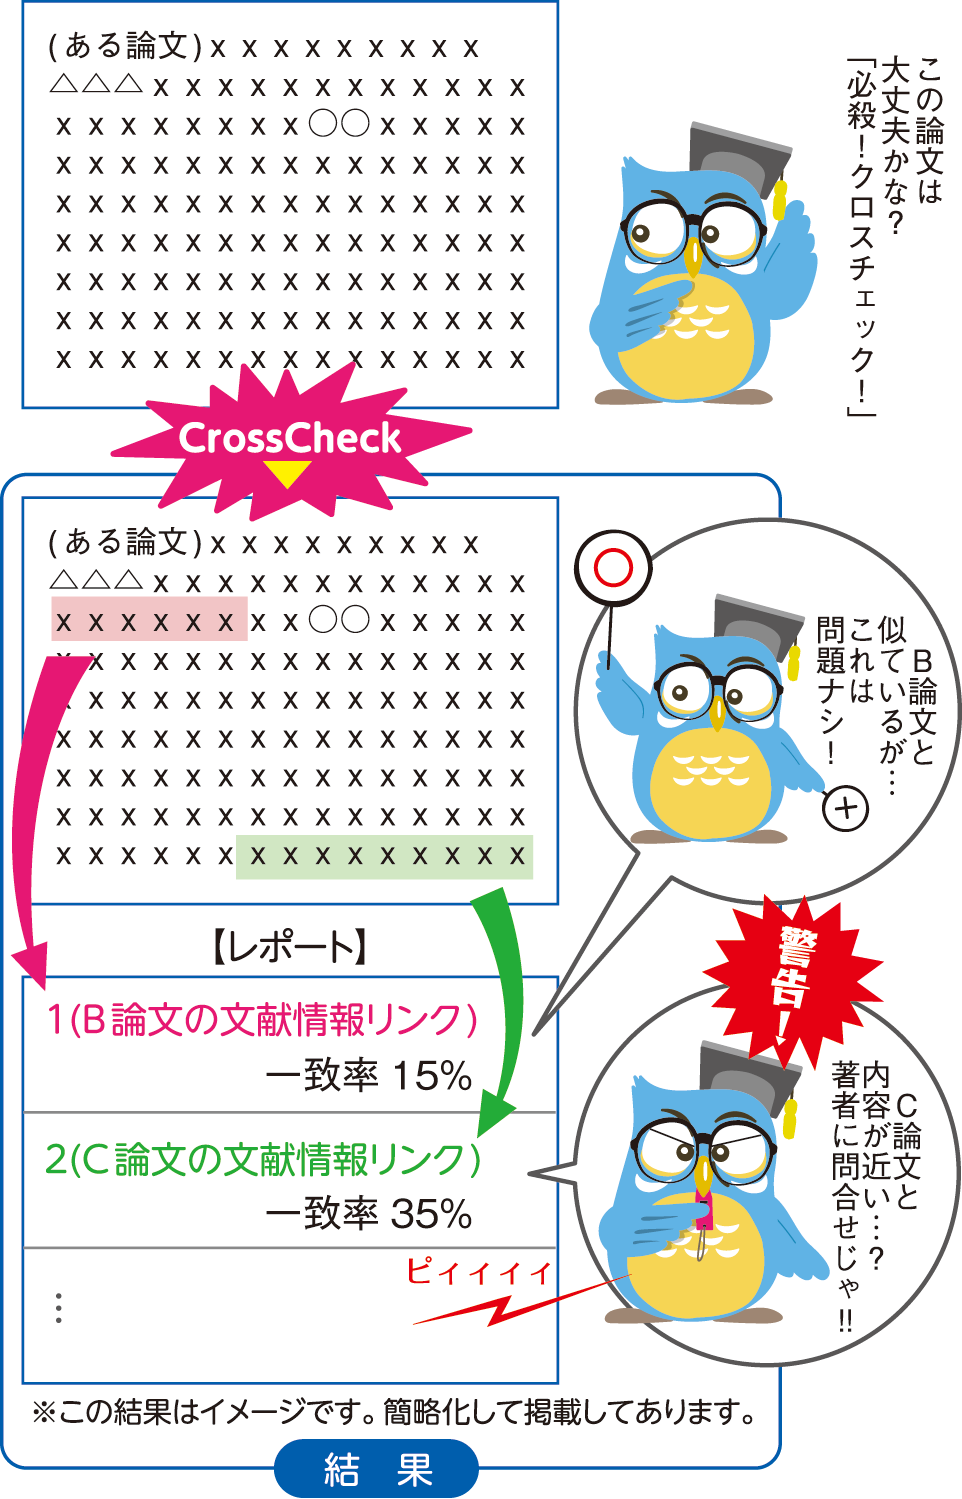 crossref_service